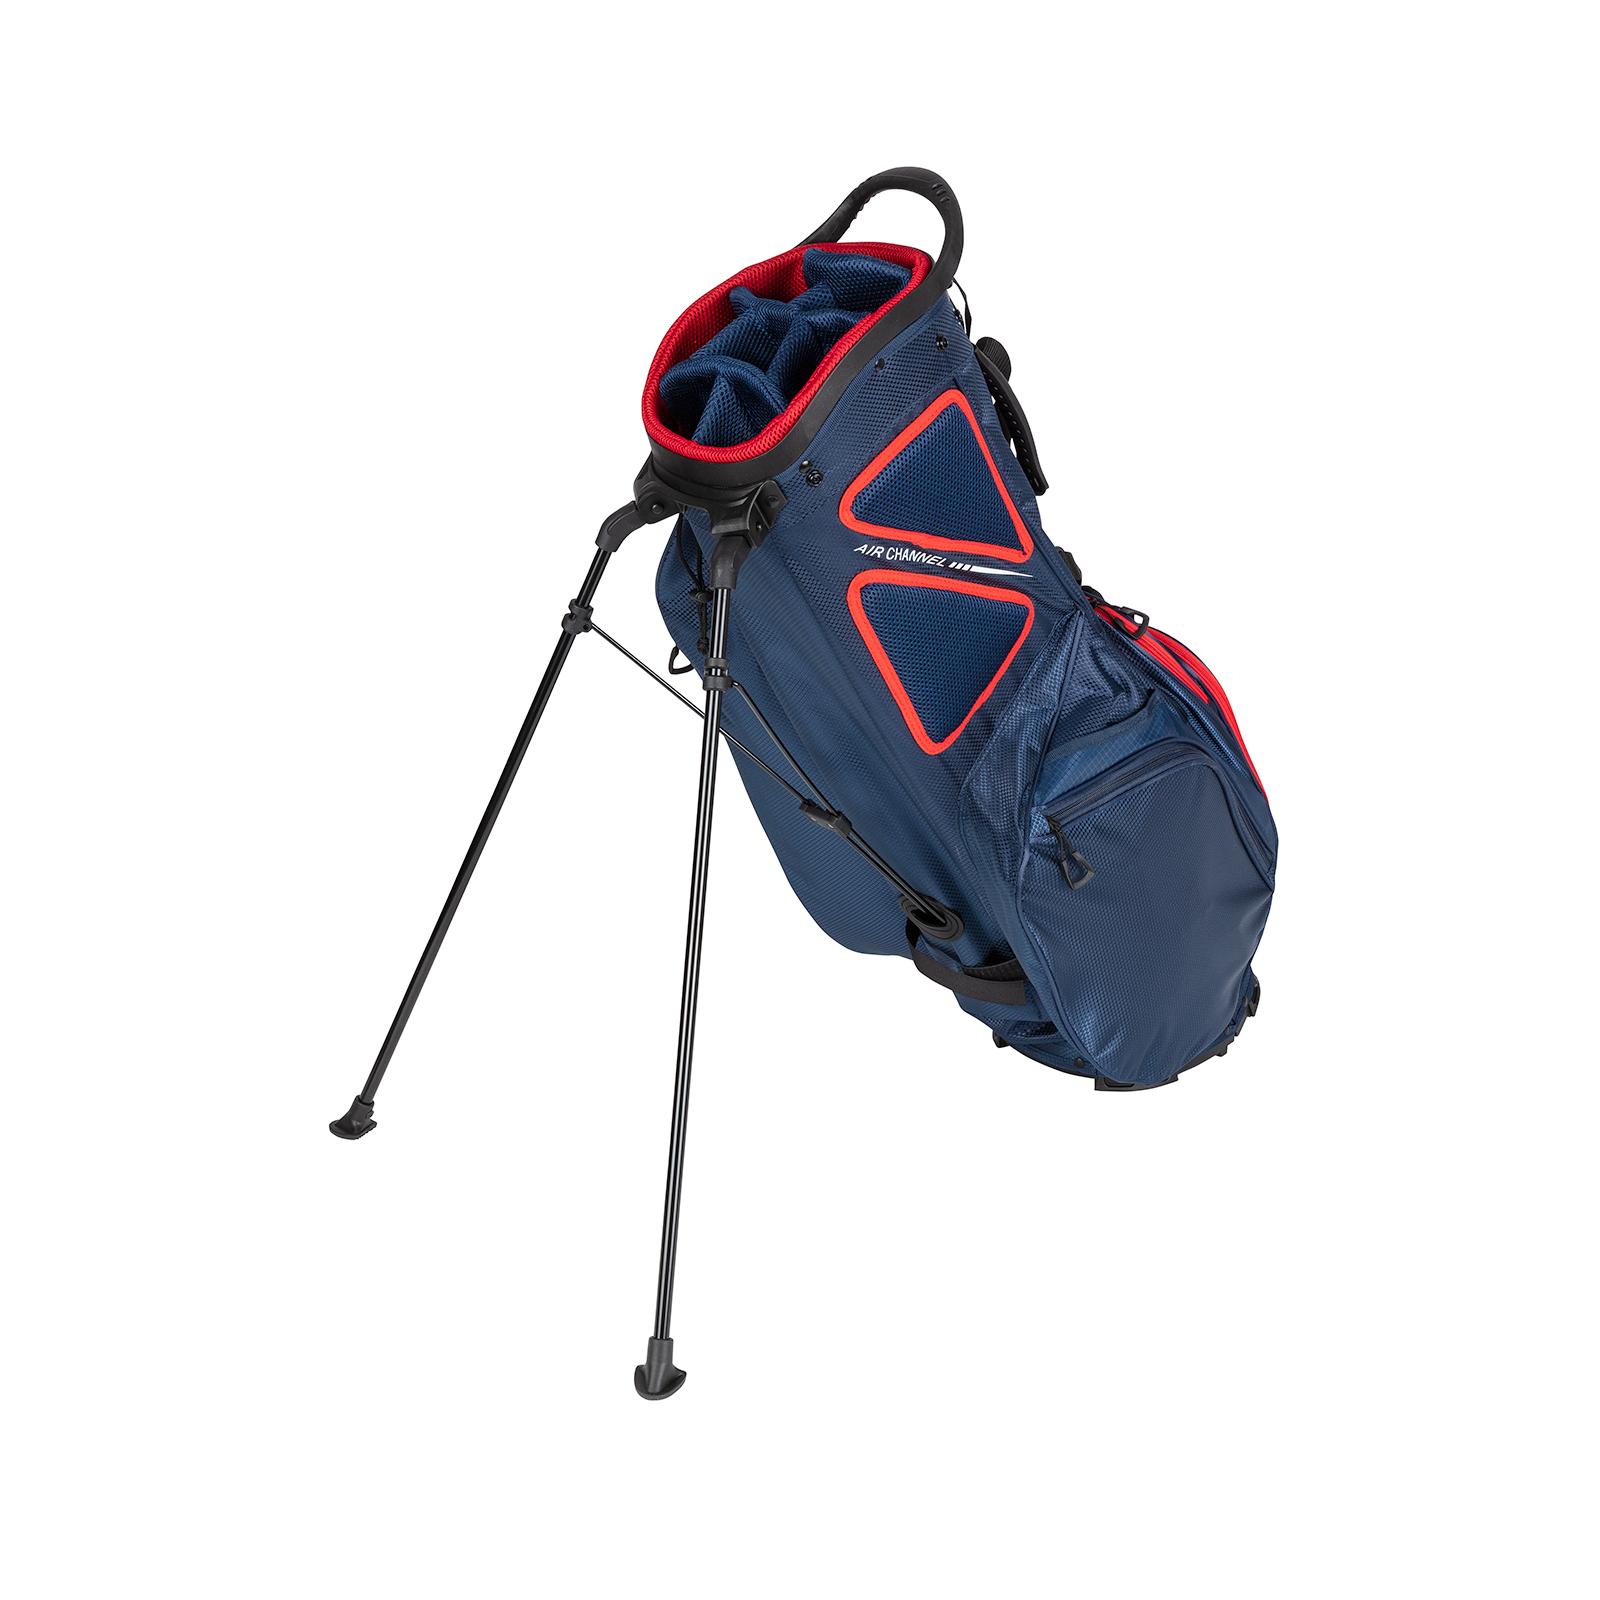 Standbag in sportlichem Design